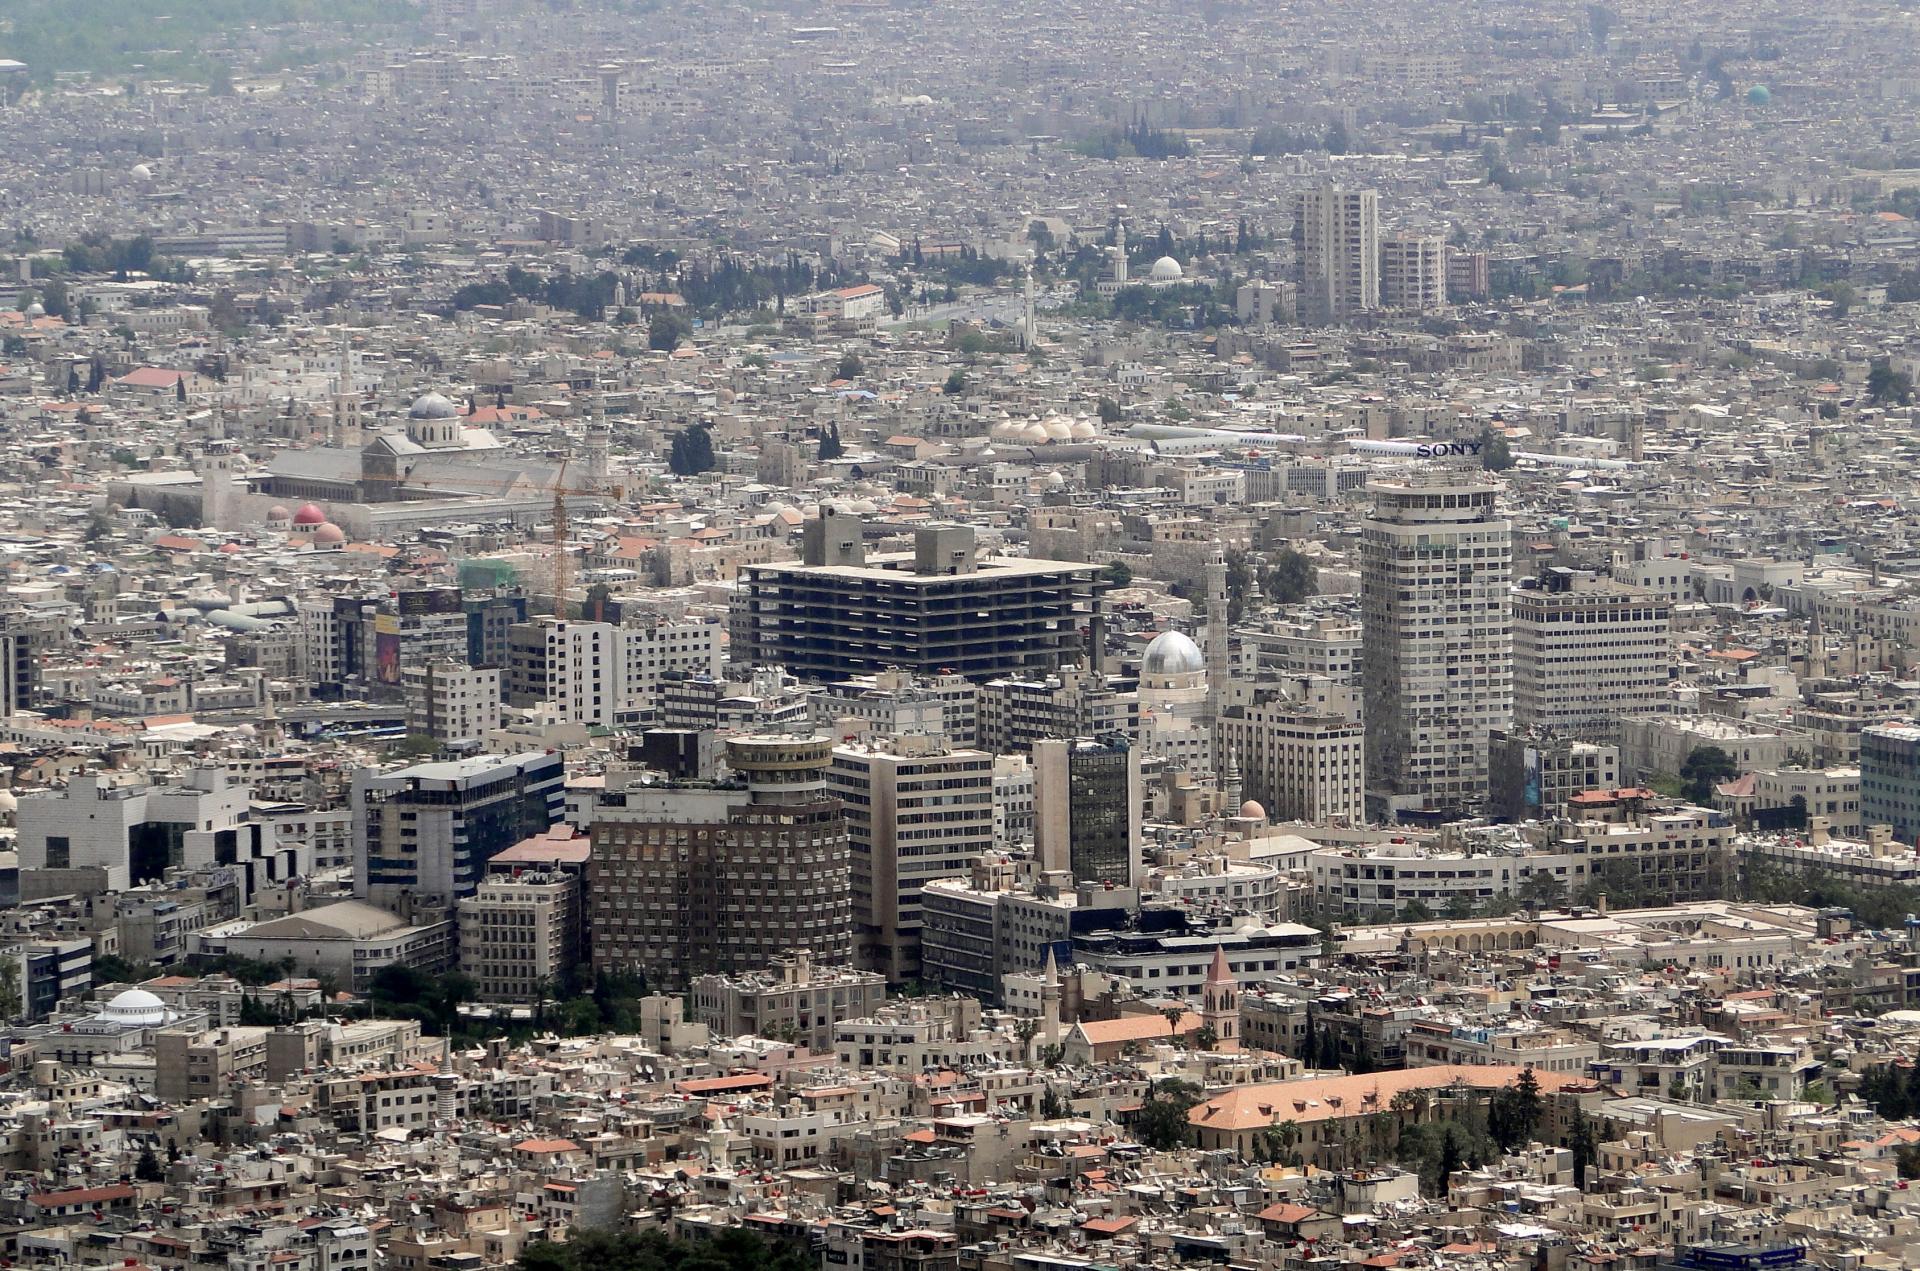 A typical modern-day neighborhood in Damascus, Credit: Bernard Gagnon / CC BY-SA 3.0